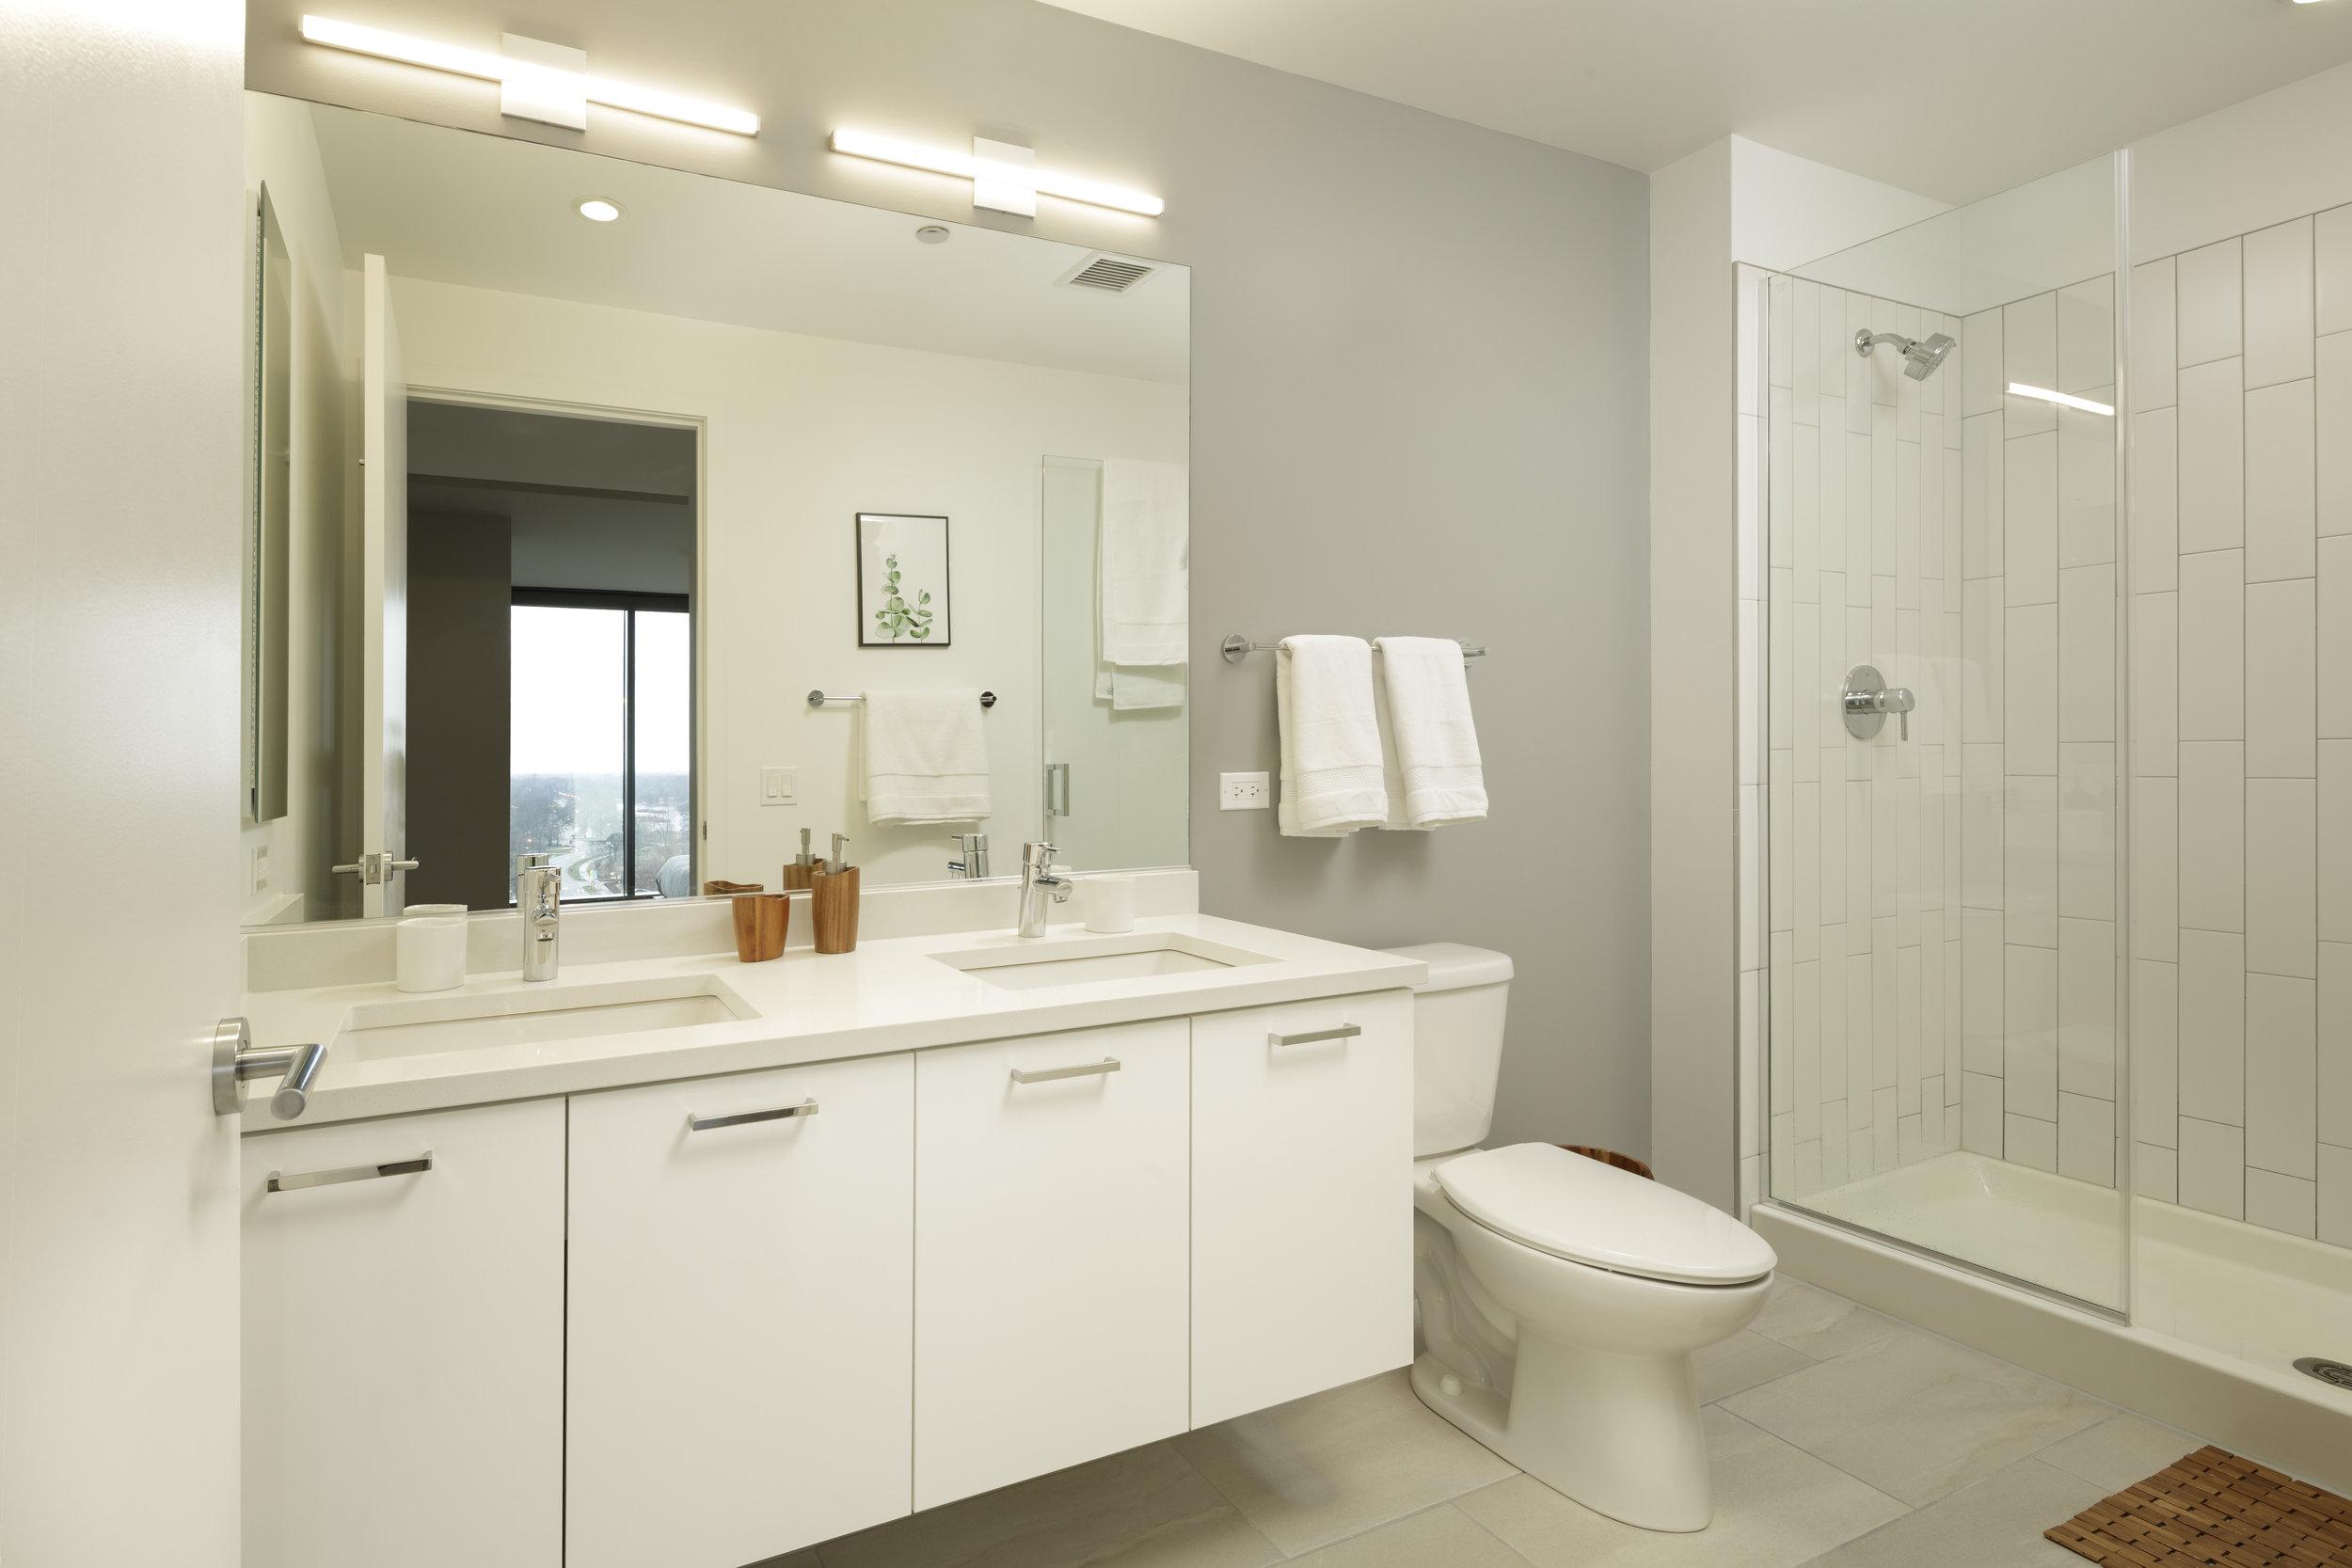 Solstice_2bed_Bathroom-1105_SS.jpg